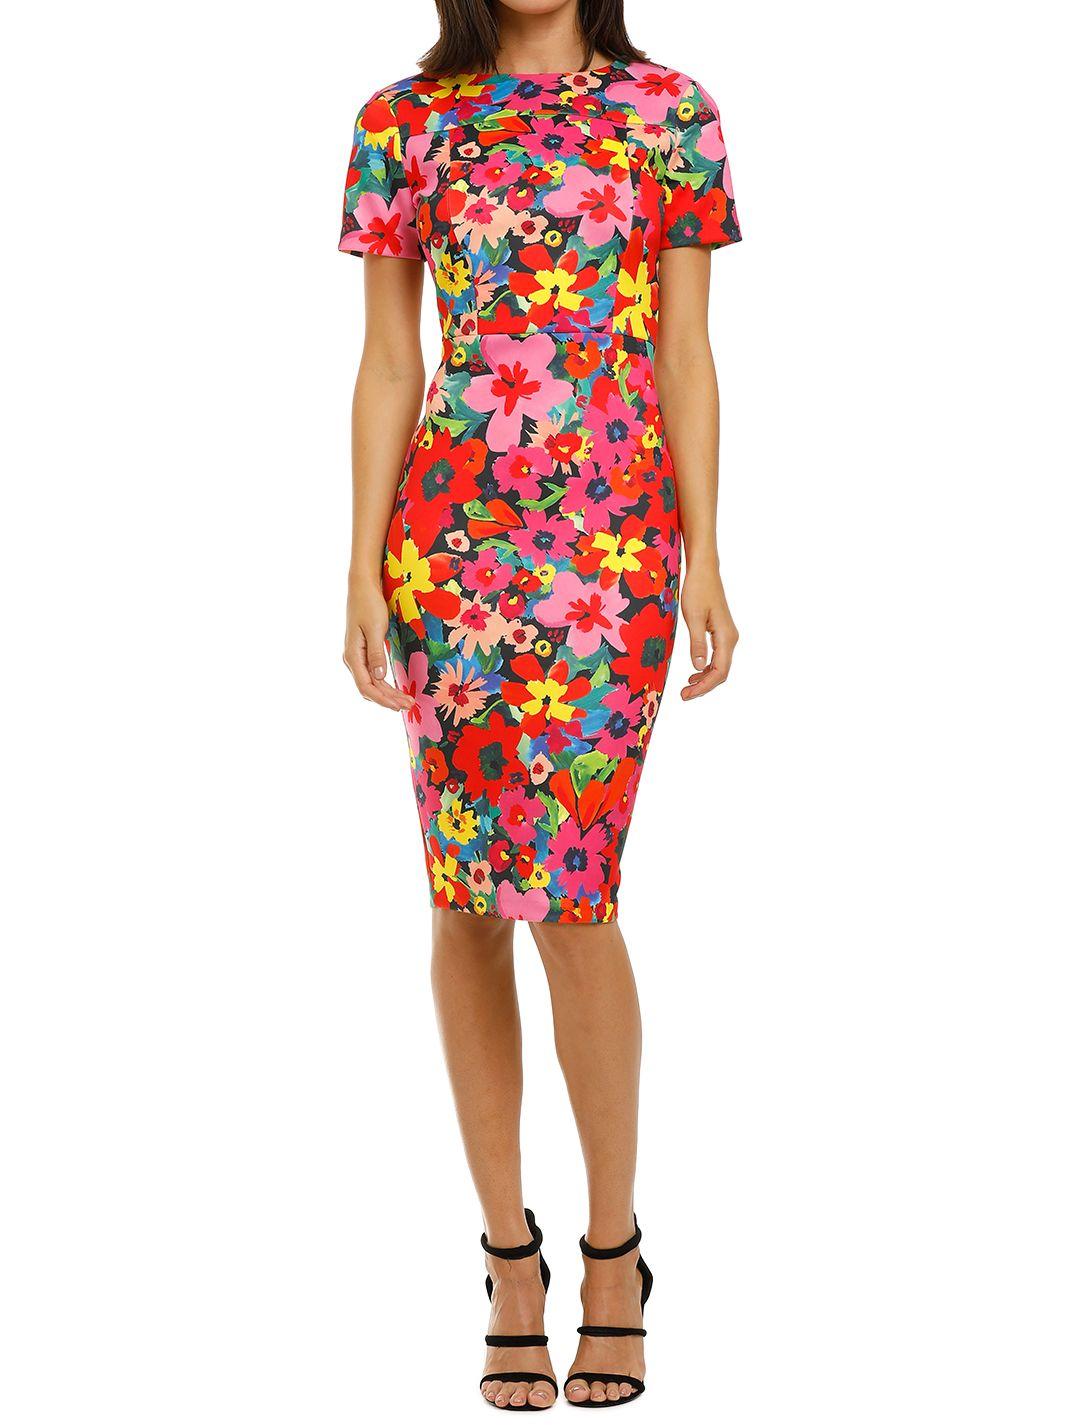 Alexia-Admor-Scuba-Sheath-Dress-Painted-Floral-Front